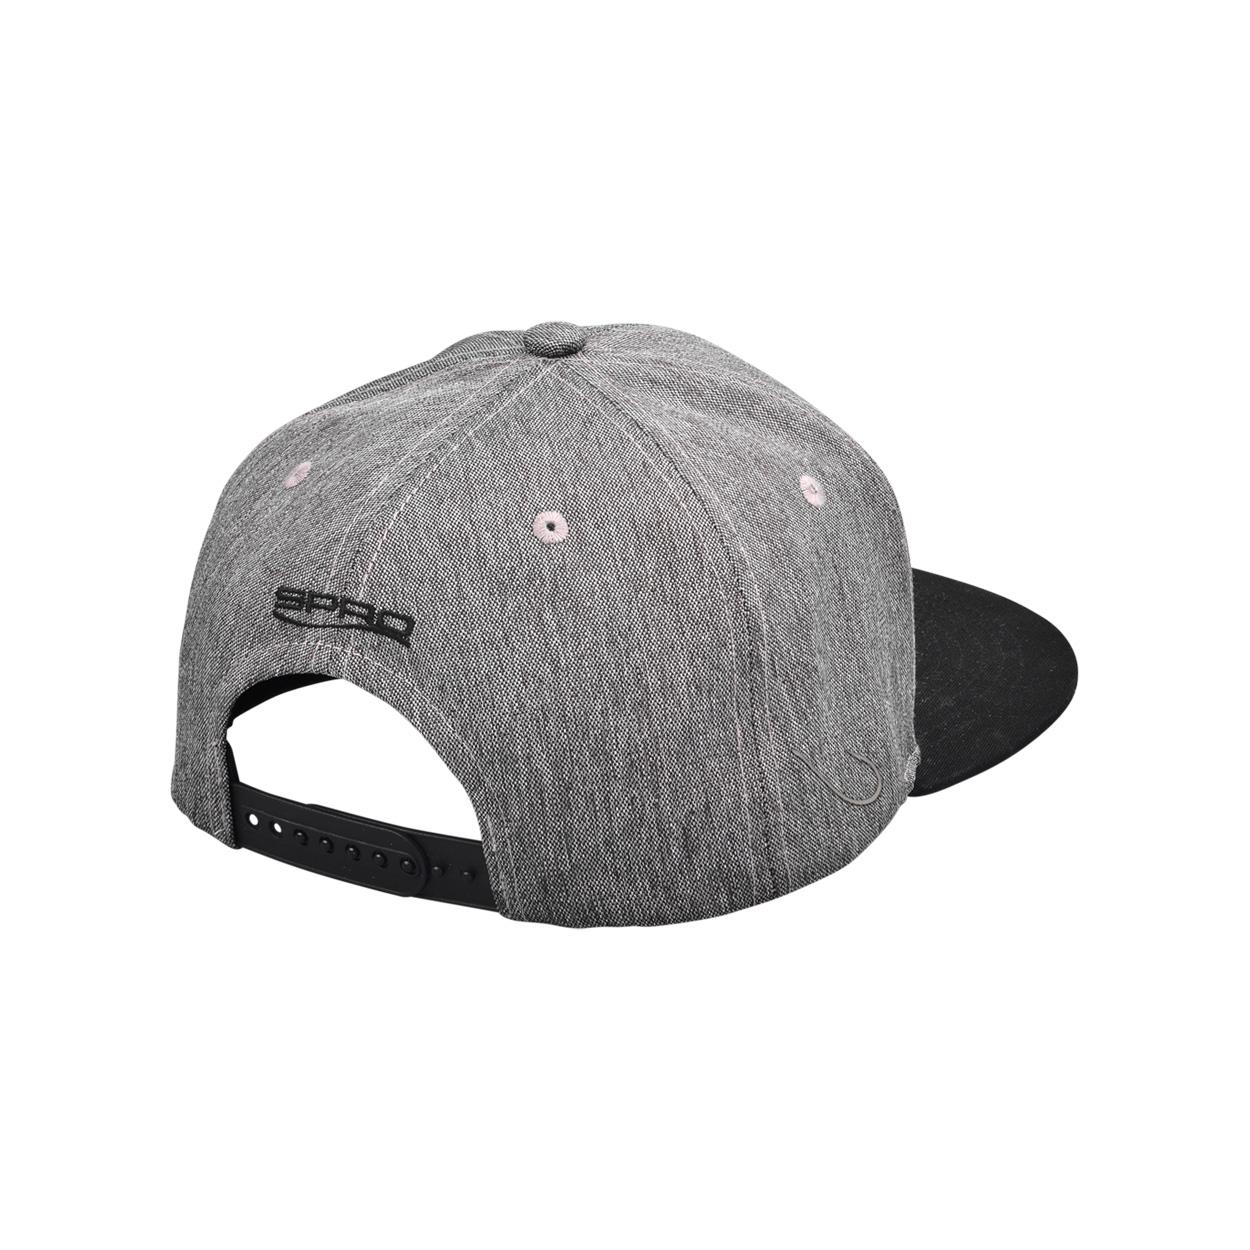 Shop Image - Classic Cap 01